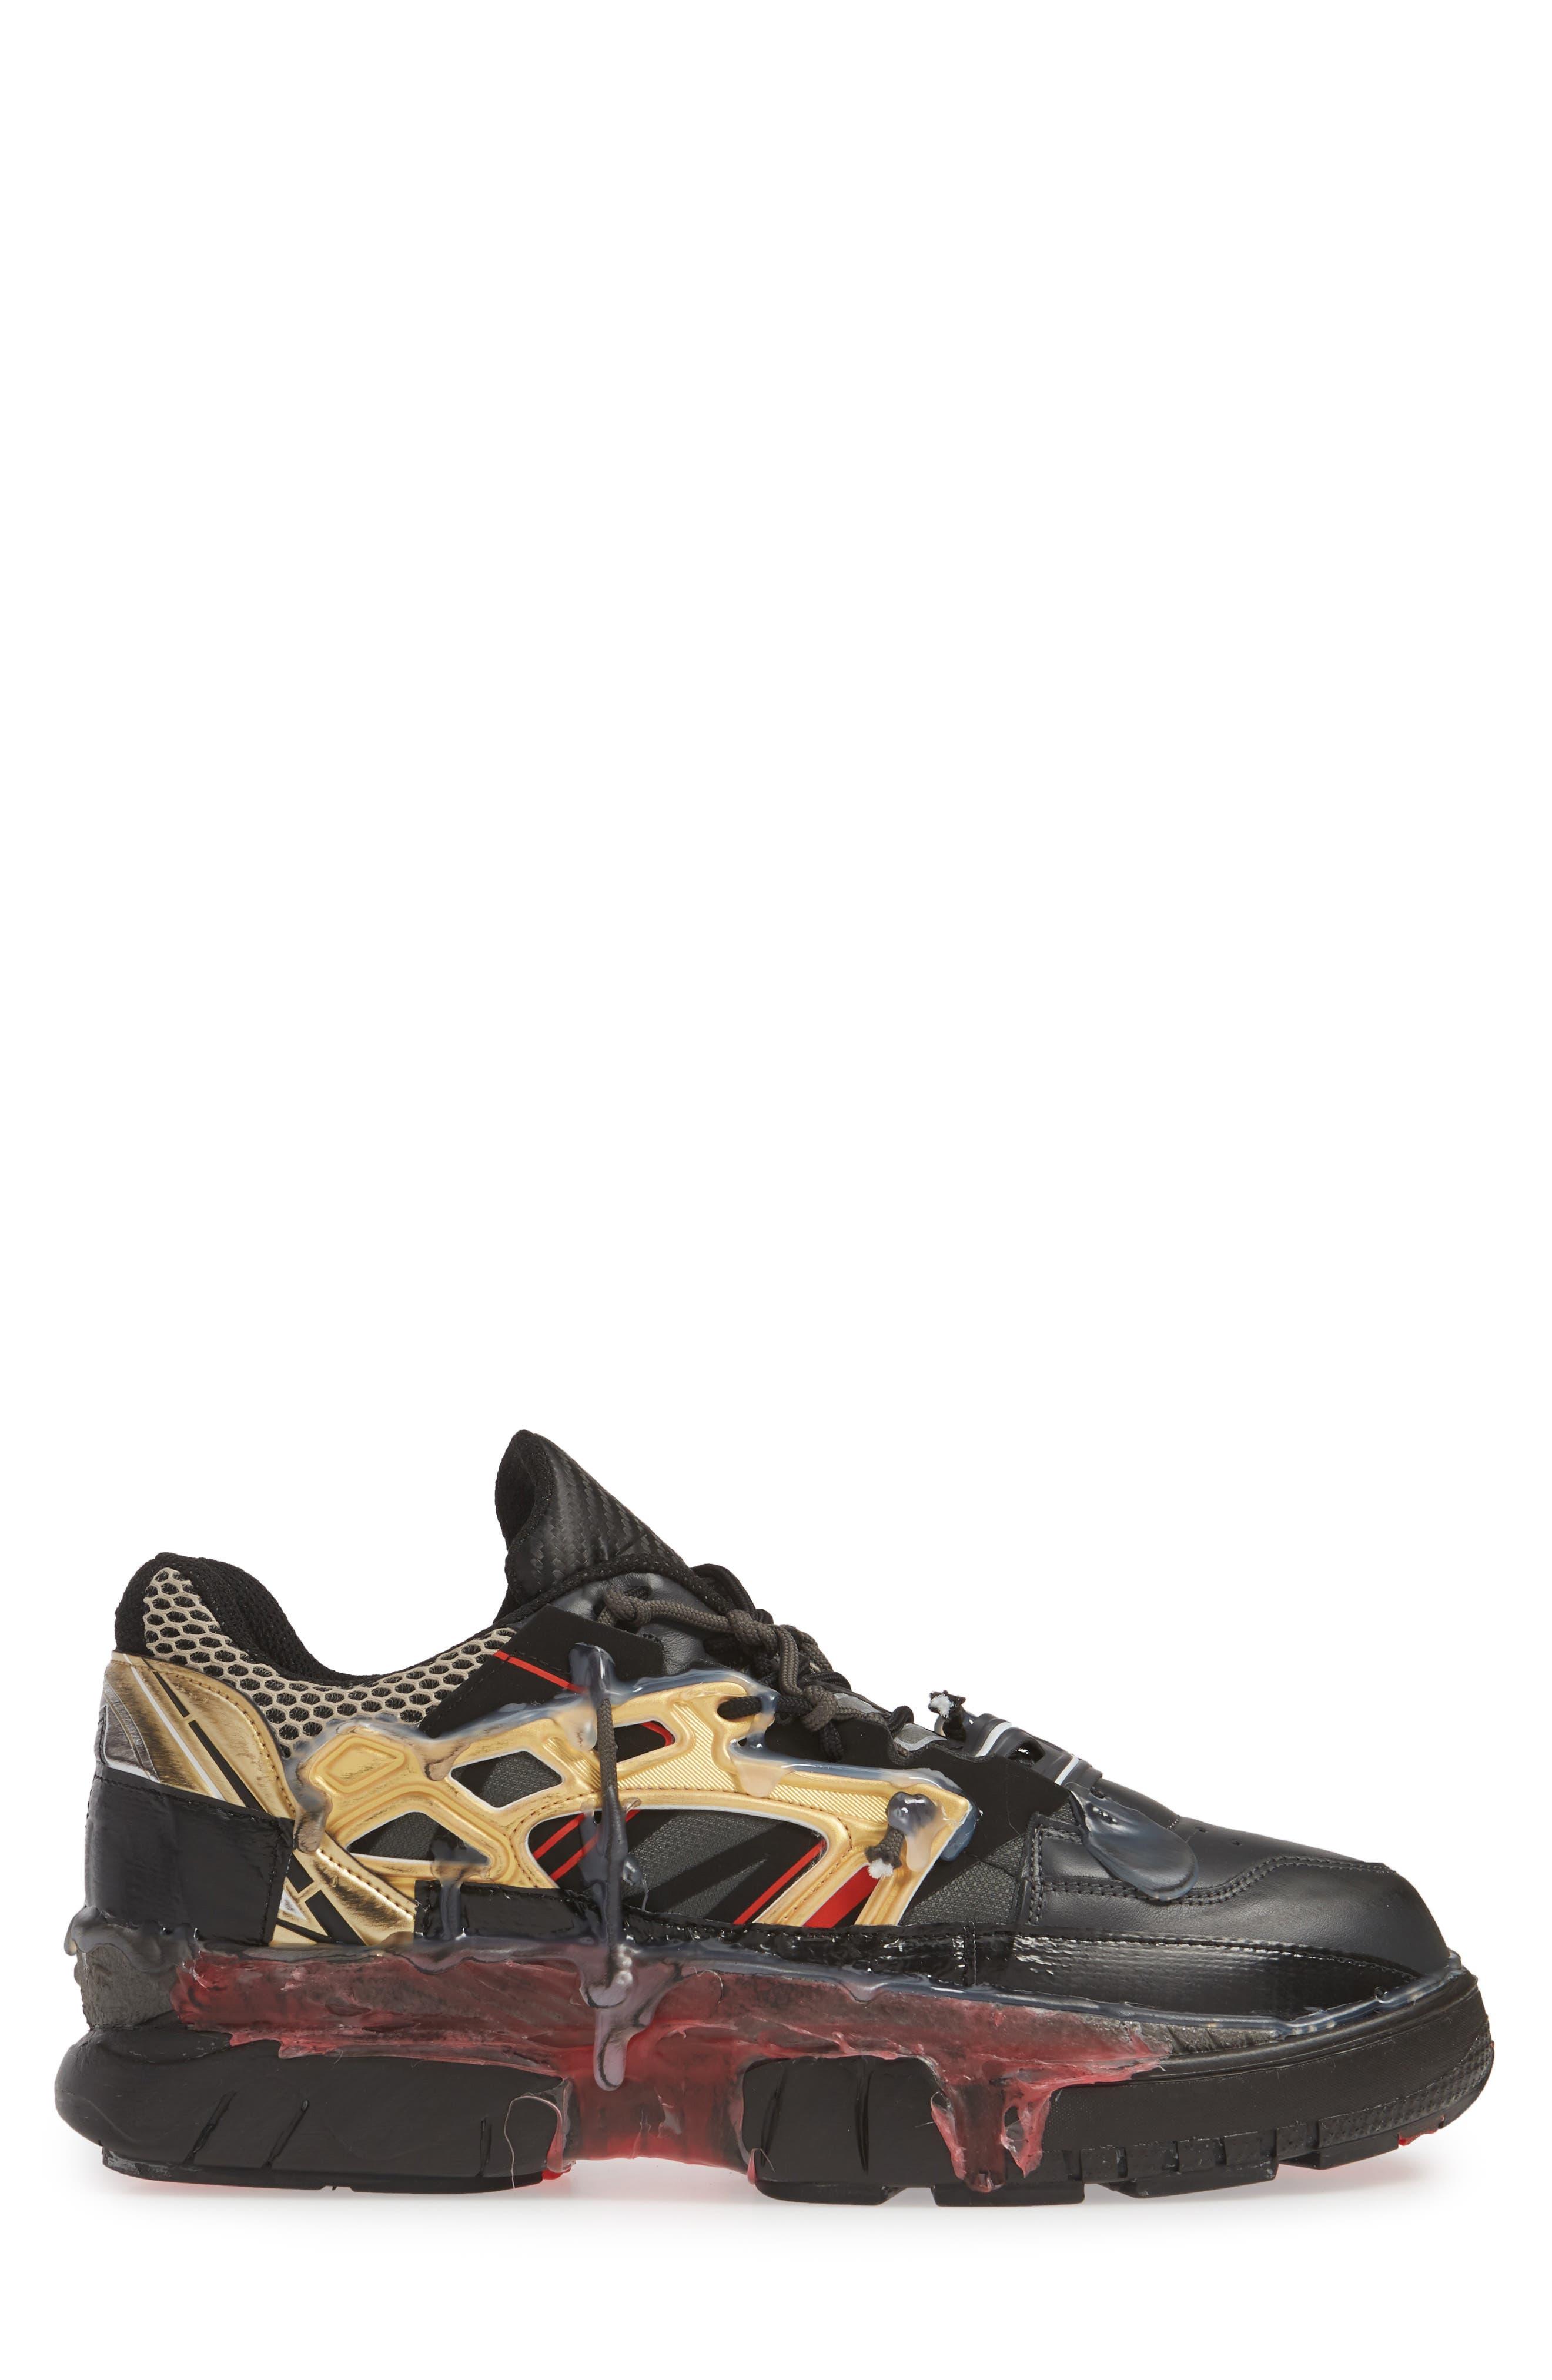 MM6 MAISON MARGIELA,                             Maison Margiela Fusion Sneaker,                             Alternate thumbnail 3, color,                             BLACK/ GOLD/ RED